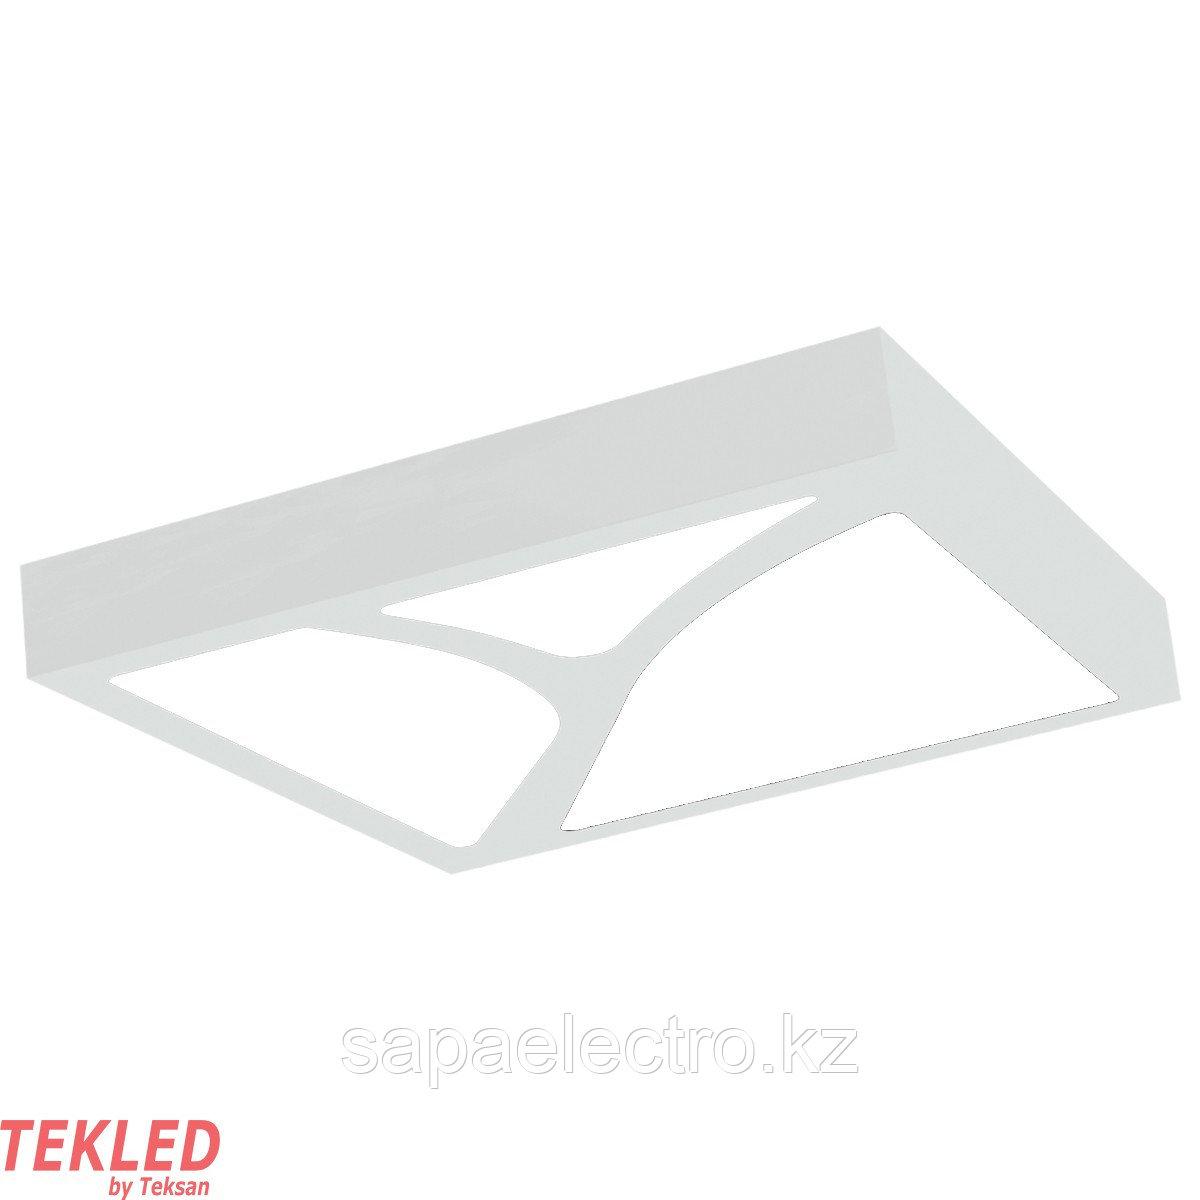 Св-к  OPALLED MARBLE 48W WH S/U  600x600 3000K  MGL